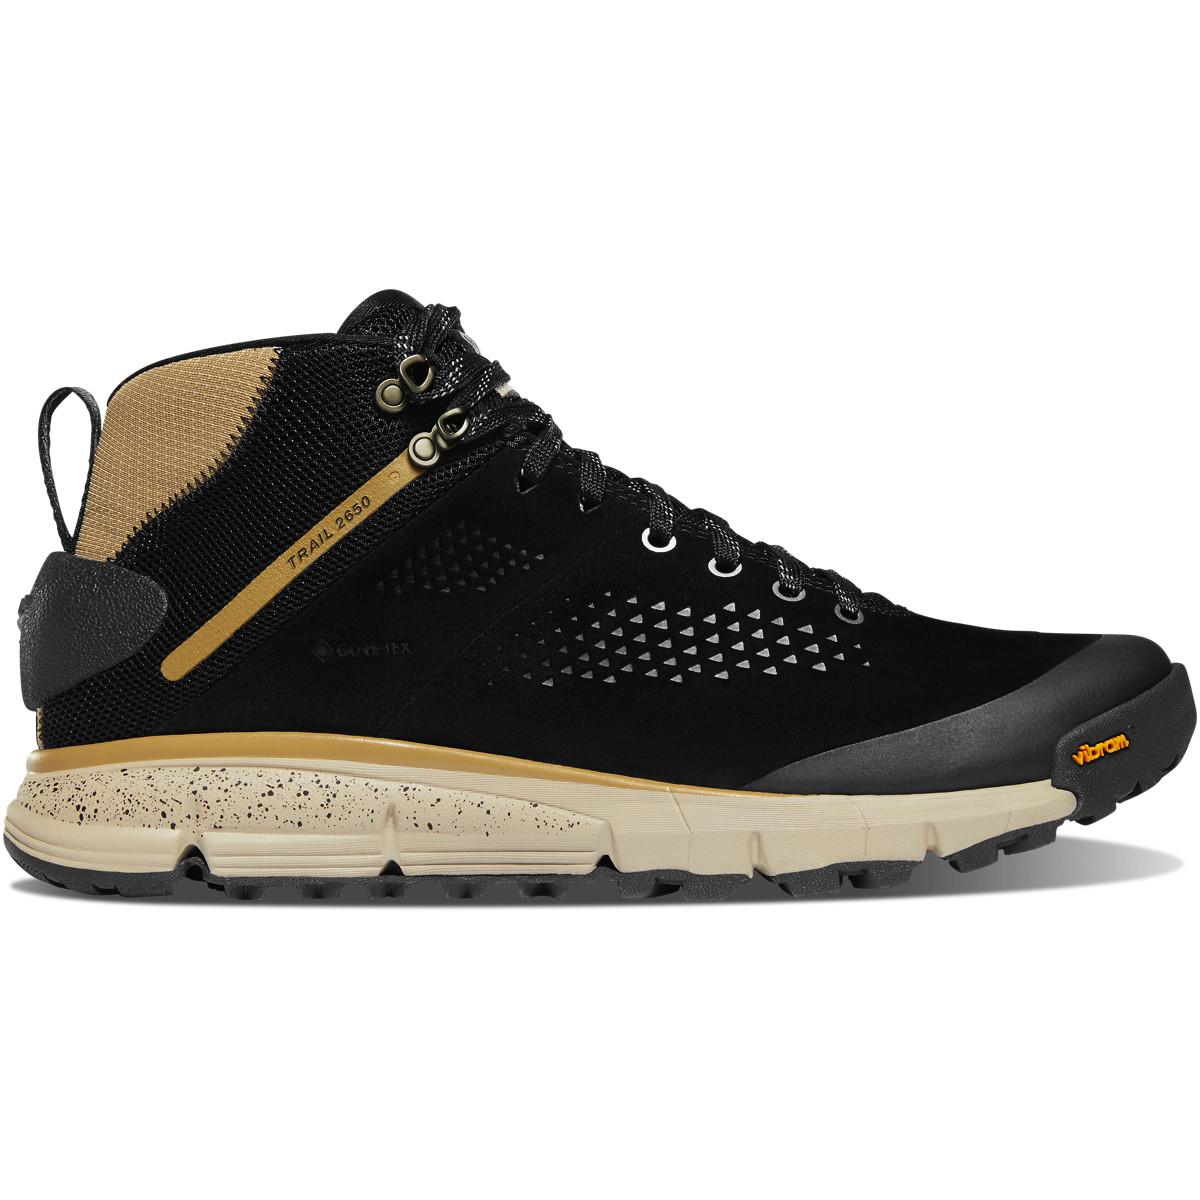 "Trail 2650 Mid 4"" Black/Khaki GTX"